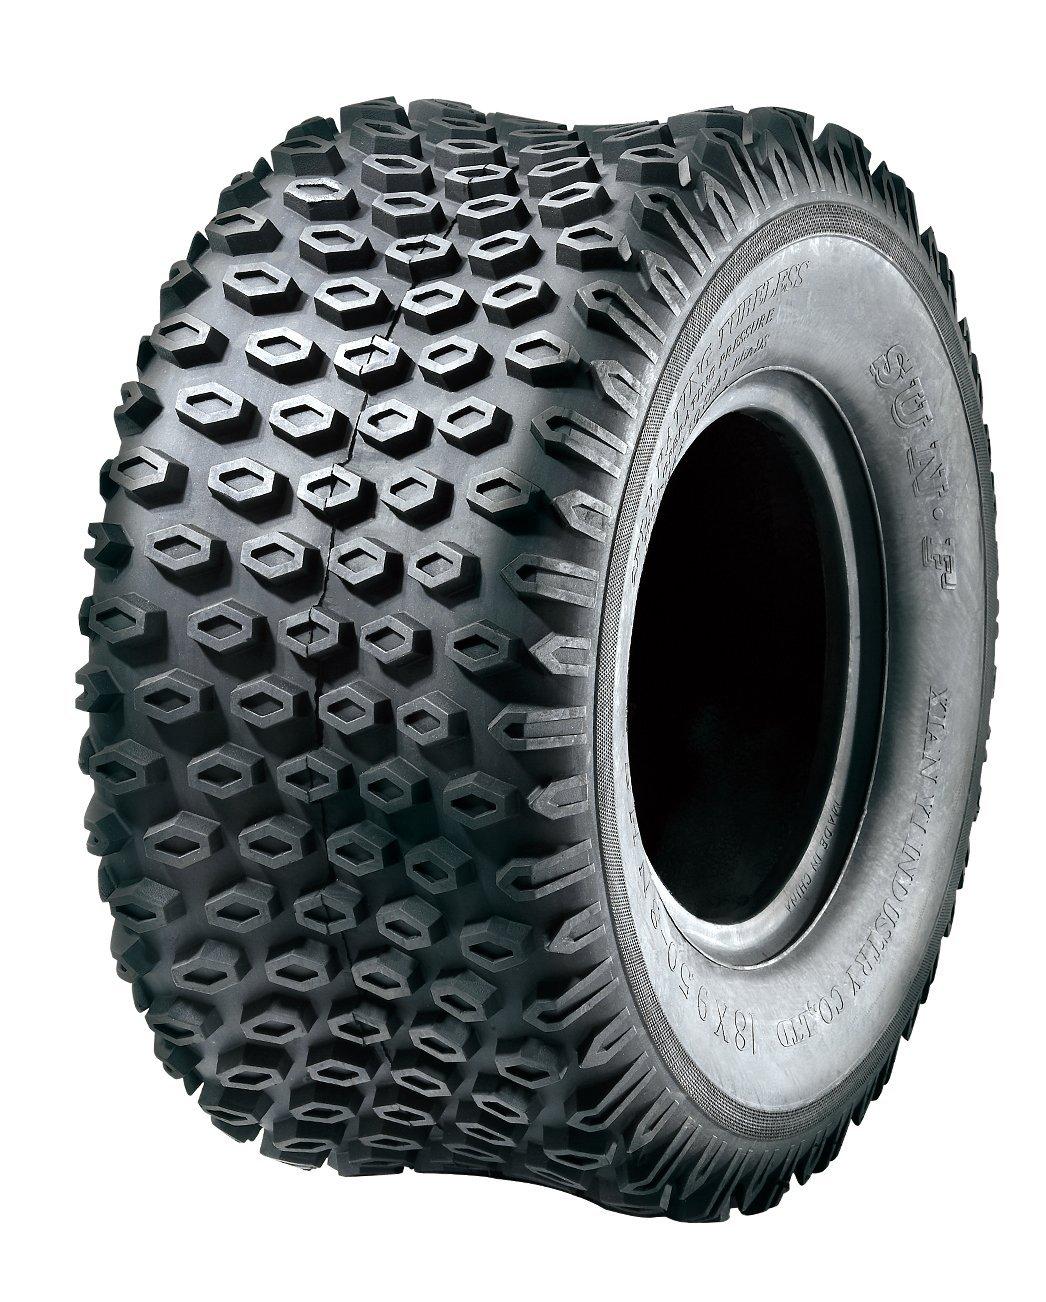 Set of 2 SunF A012 ATV Tires 18x9.5-8, 2 Ply